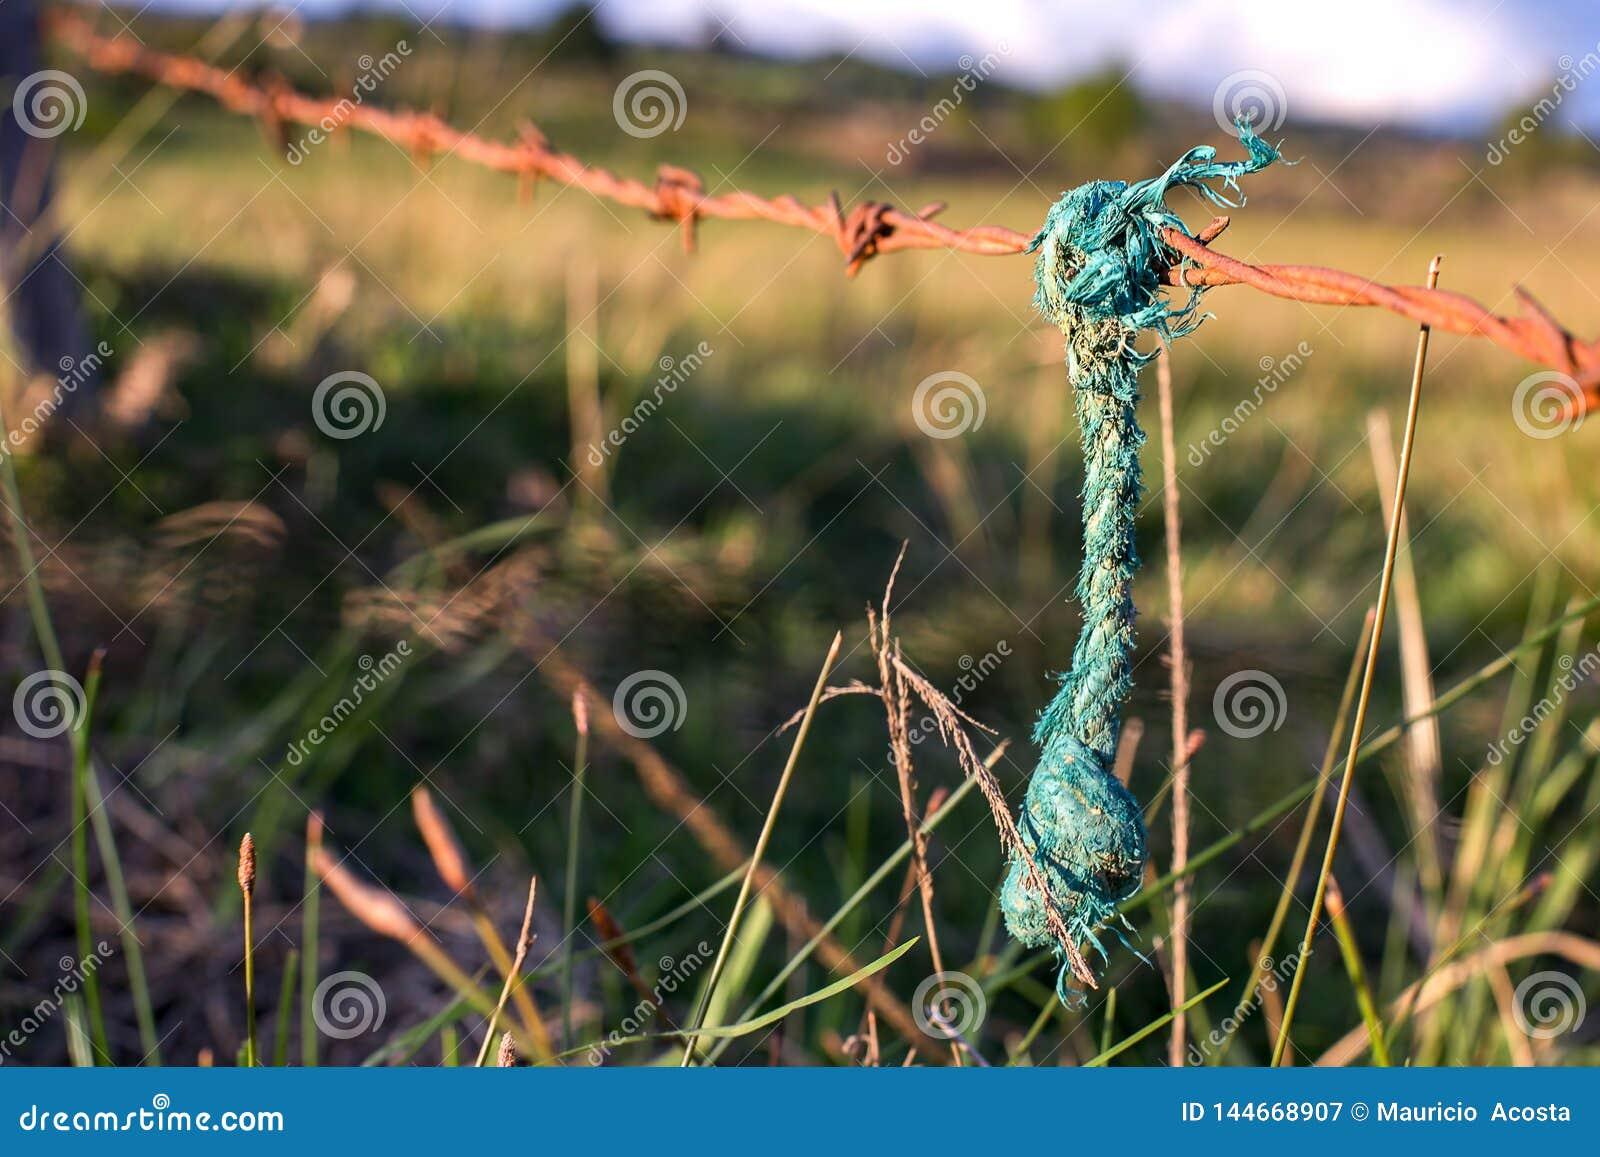 Corda verde que pendura de uma farpa oxidada prendida